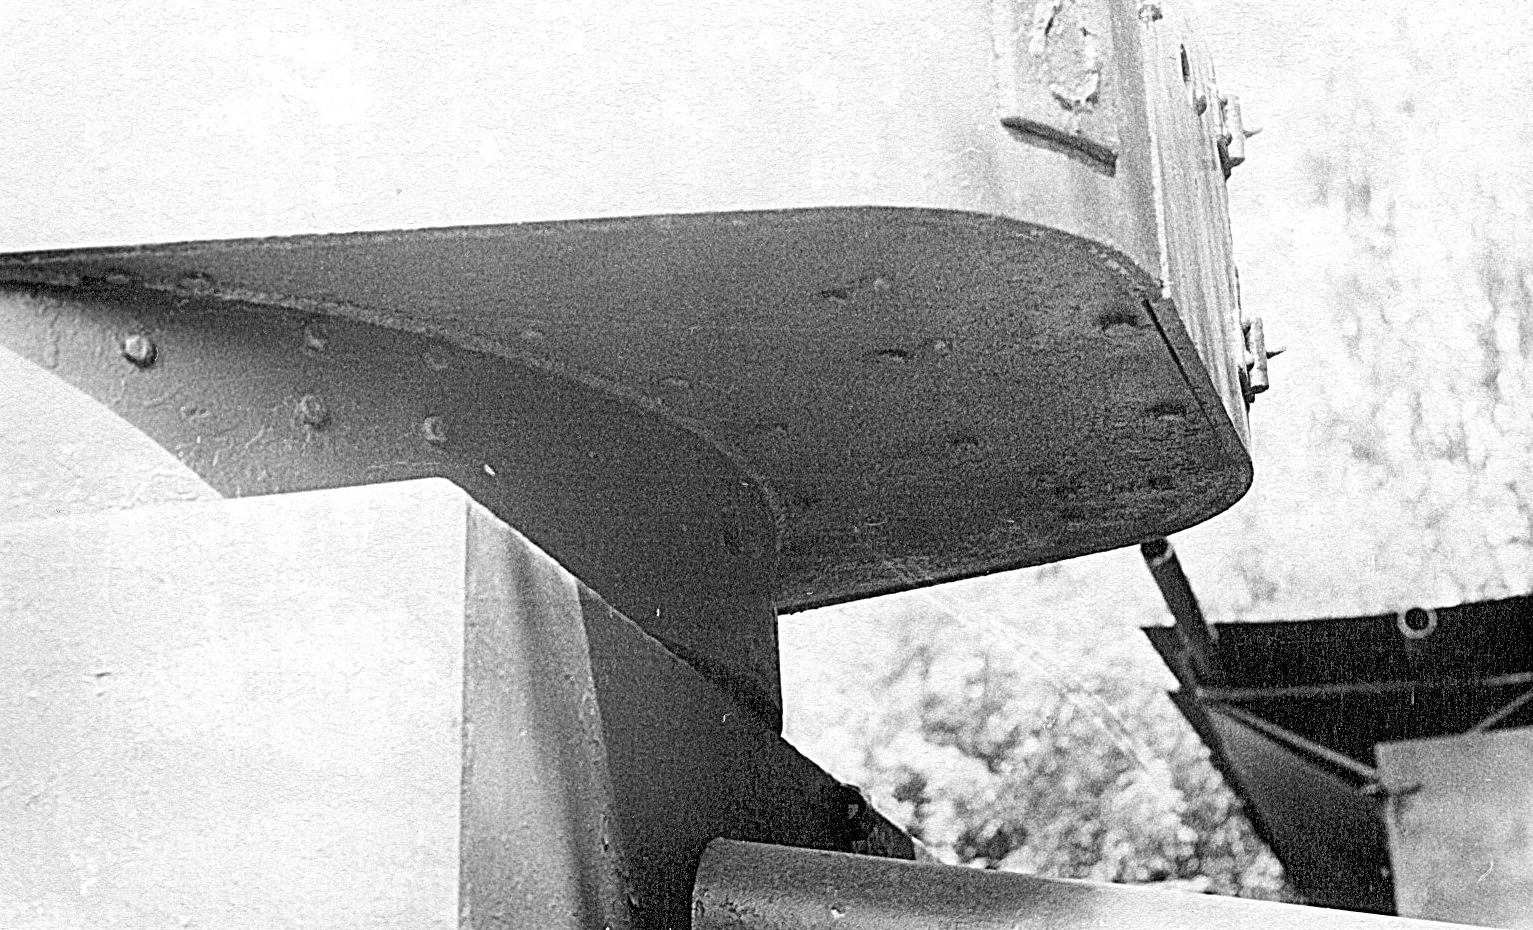 Танк Т-26, низ задней части башни